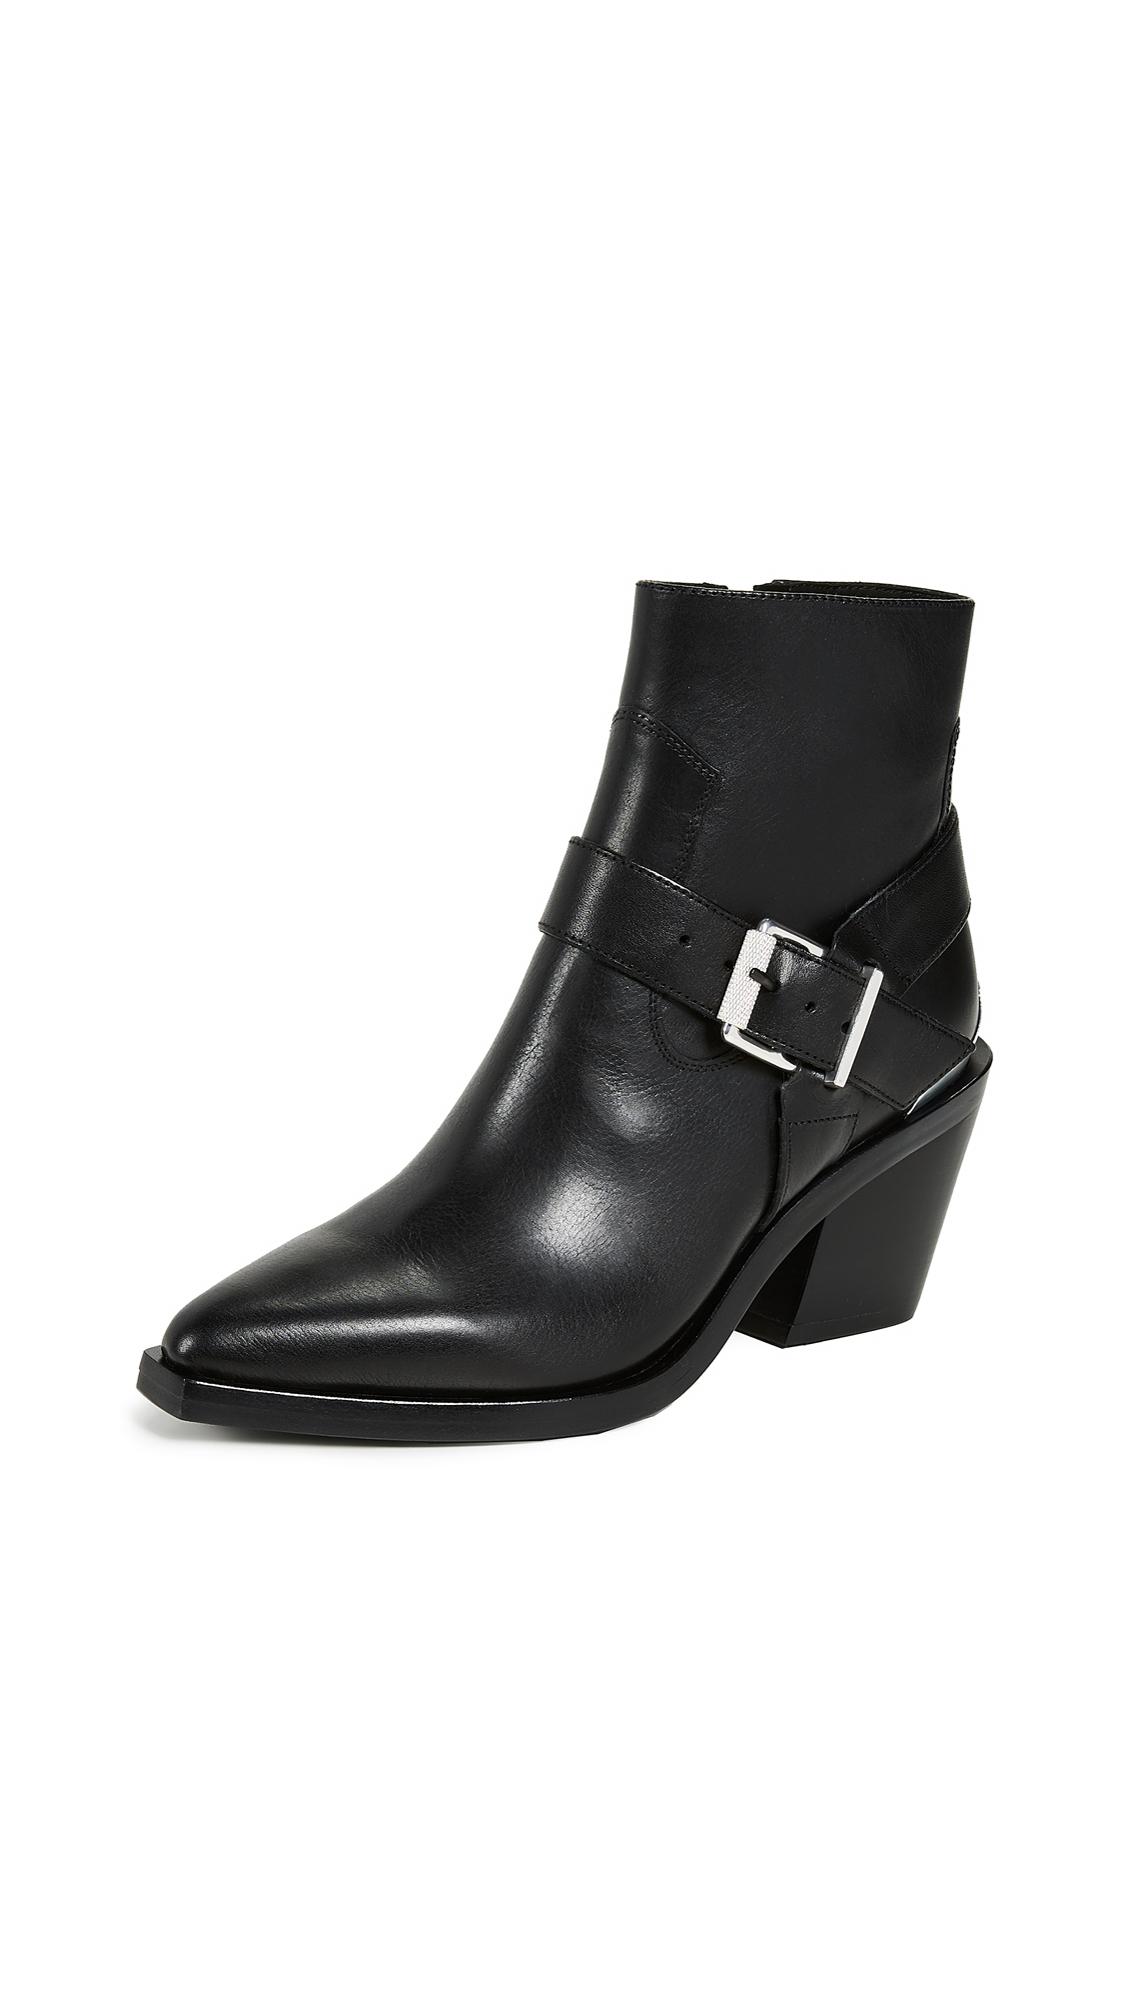 Rag & Bone Ryder Boots - Black